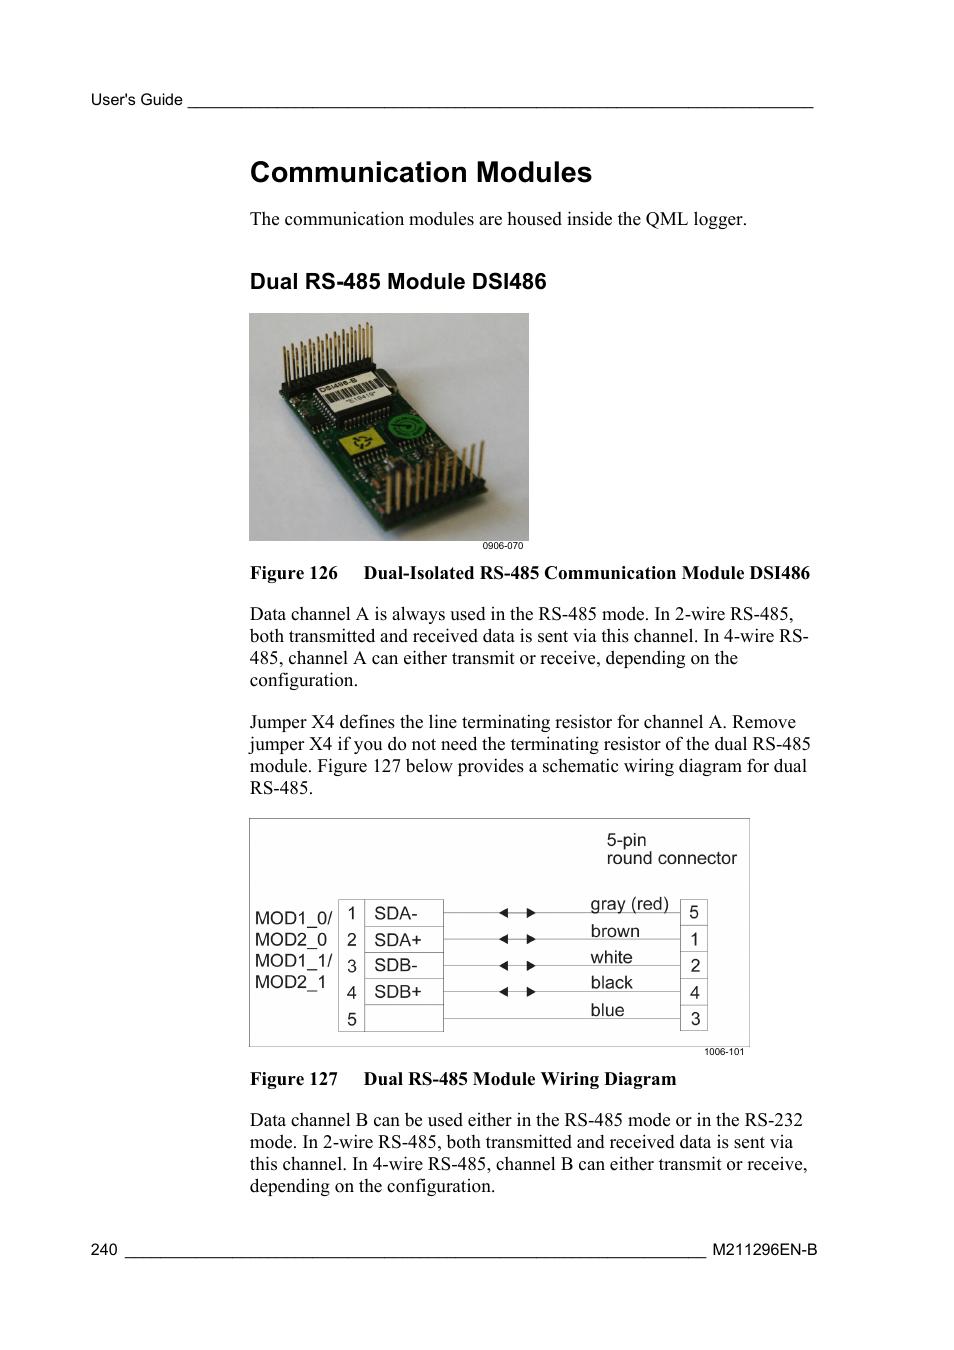 medium resolution of communication modules dual rs 485 module dsi486 vaisala aws330 user manual page 242 296